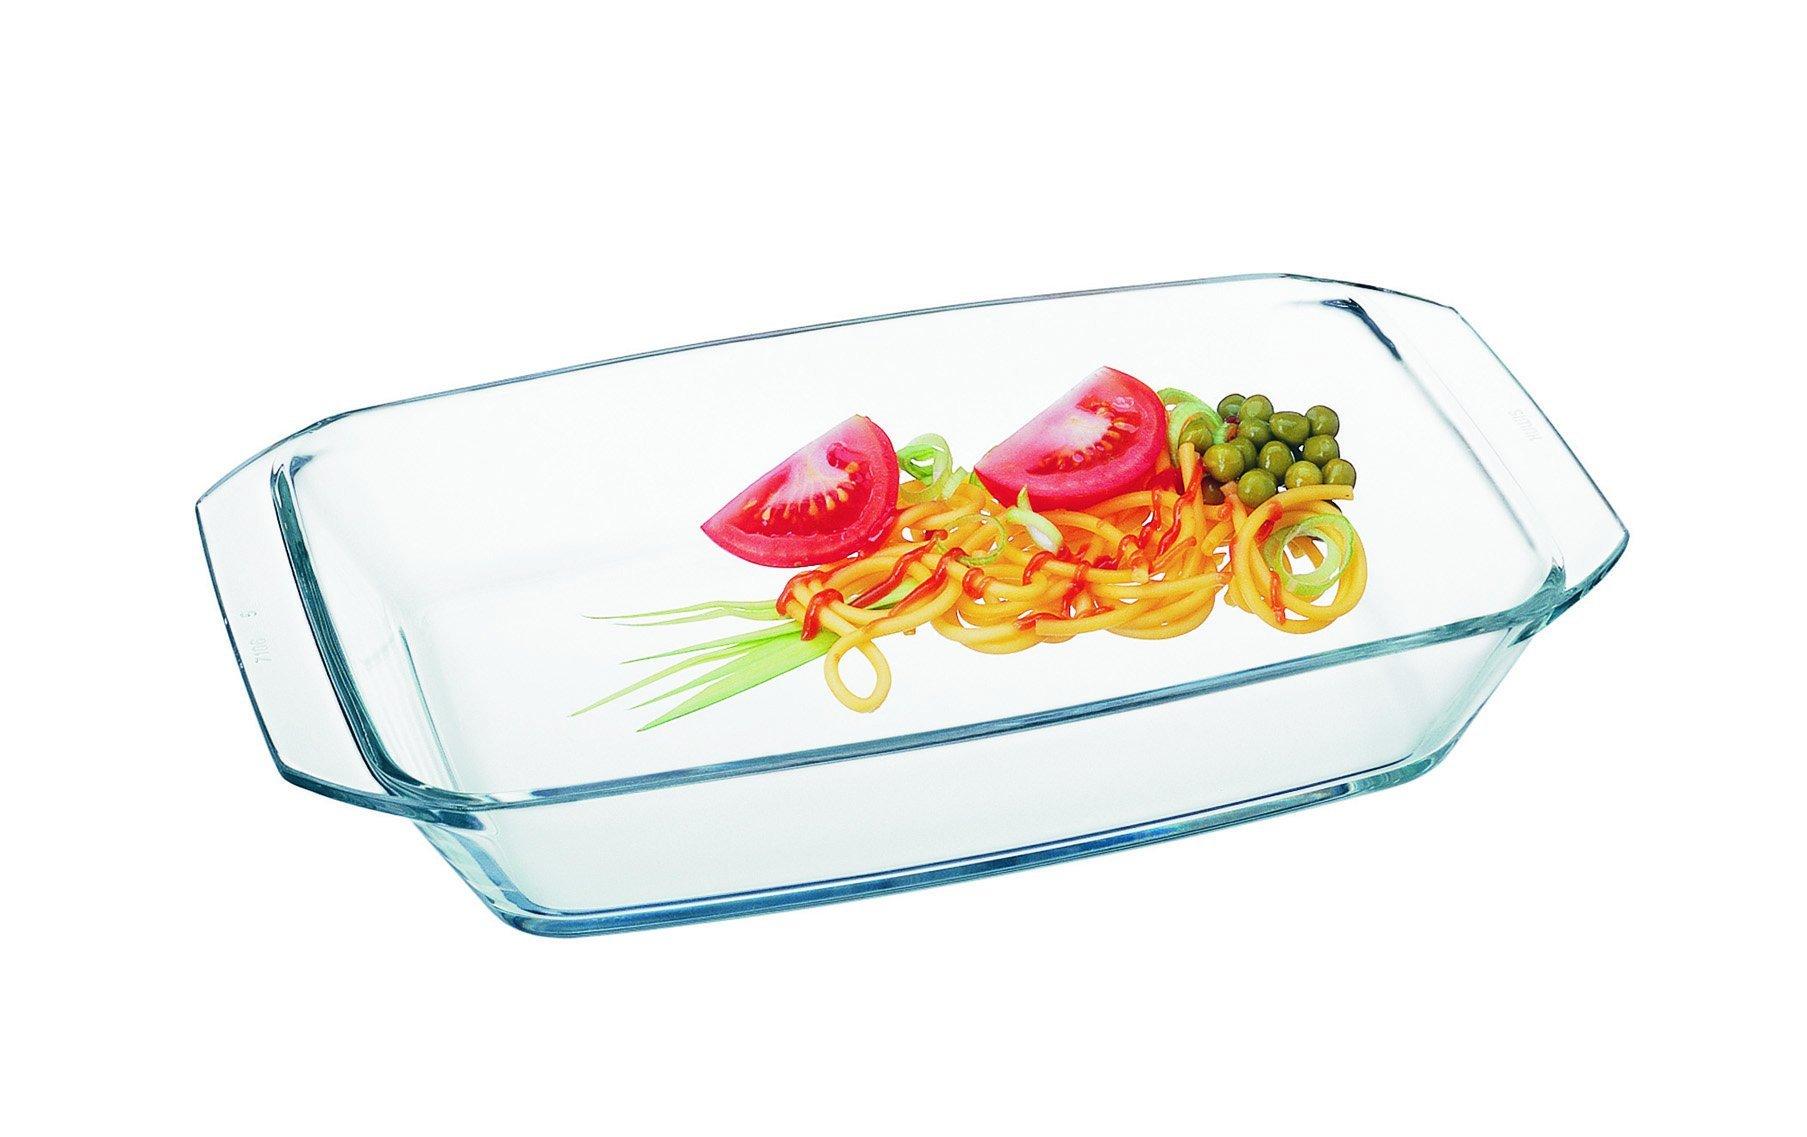 Simax Glassware 7106 Rectangular Roaster, 1.6-Quart, Clear by Simax Glassware